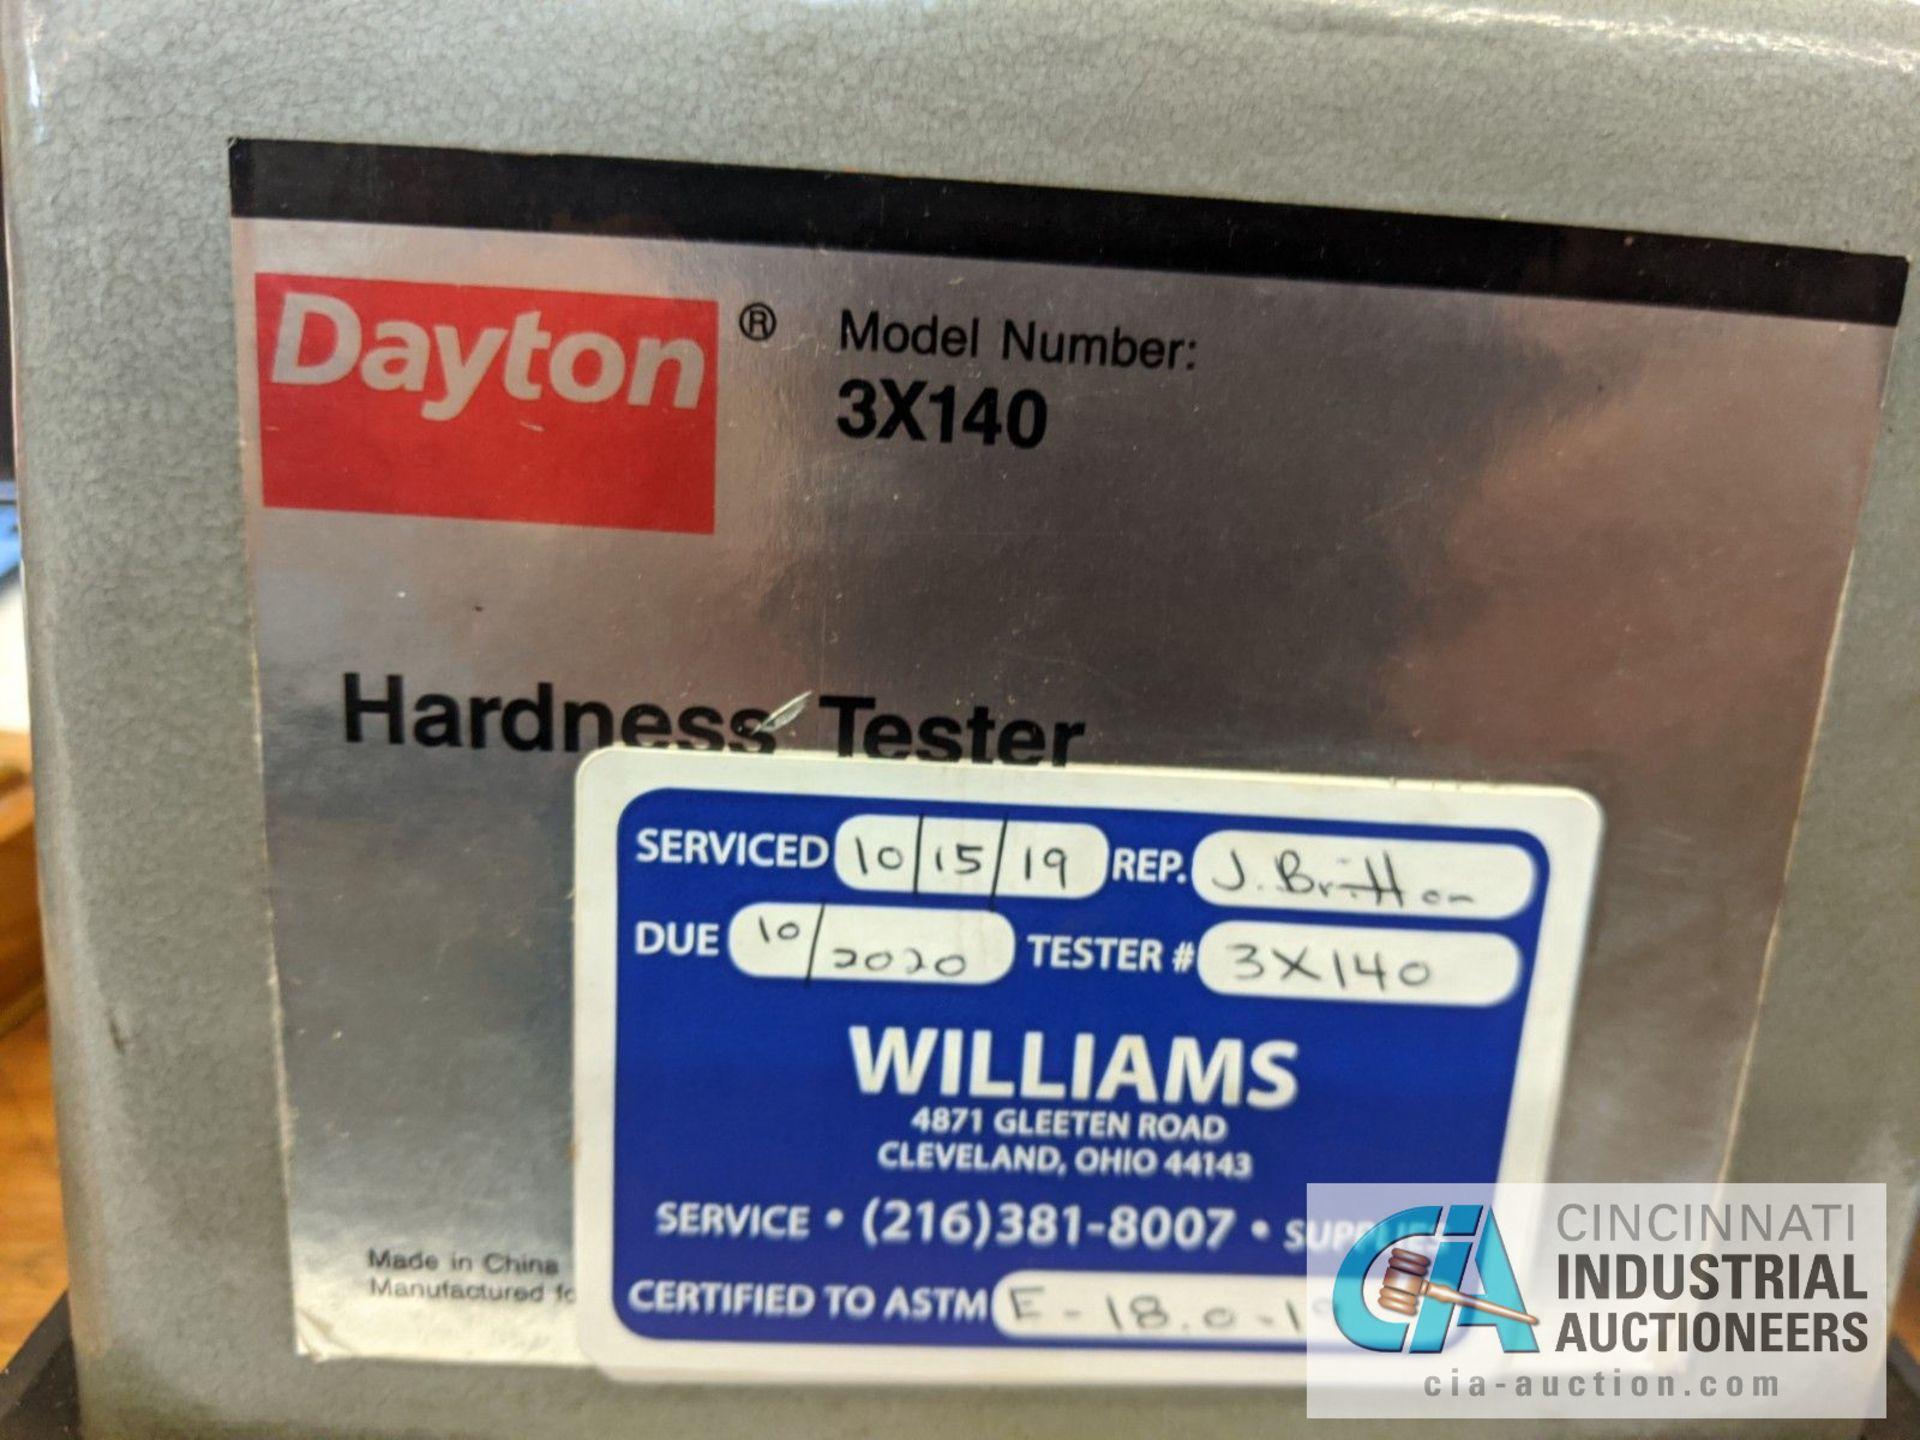 DAYTON MODEL 3X140 HARDNESS TESTER - Image 4 of 7